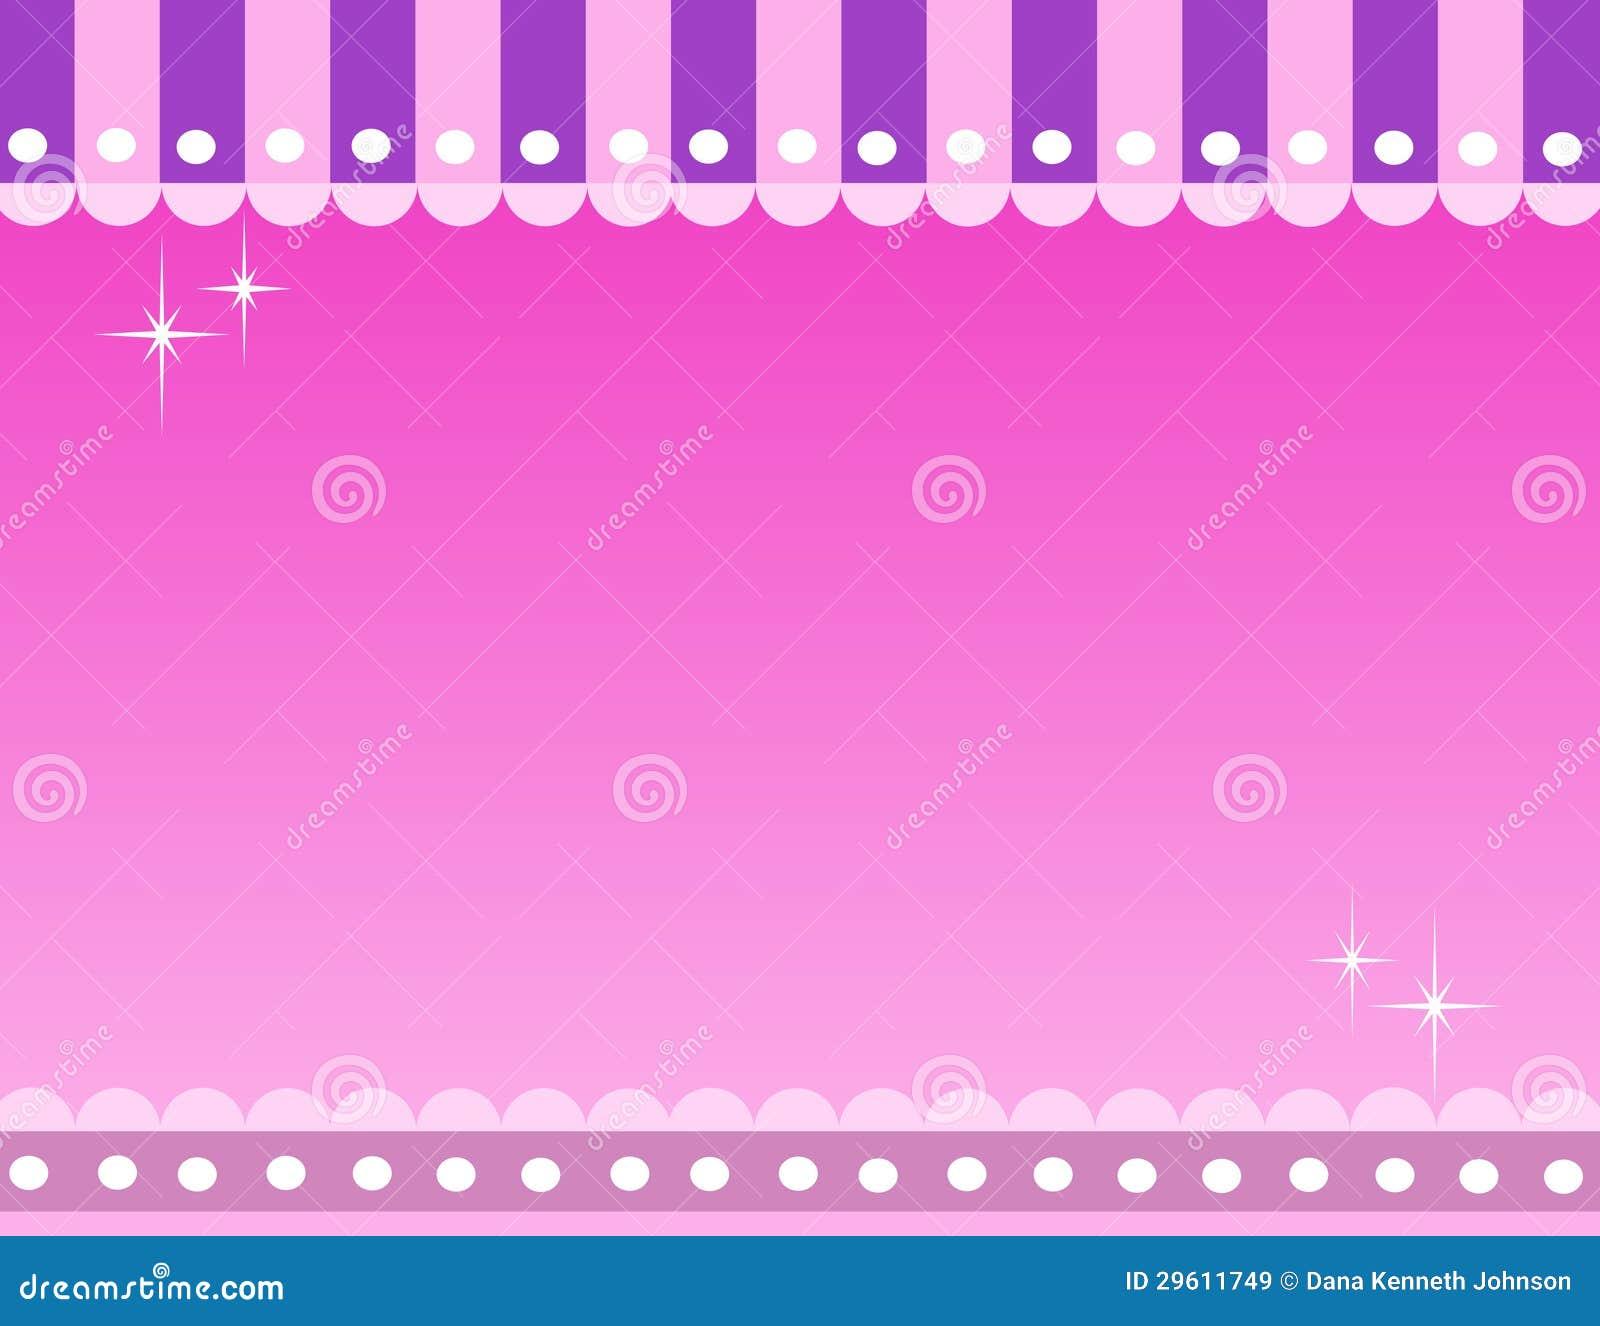 Candy Shoppe Background Royalty Free Stock Images Image